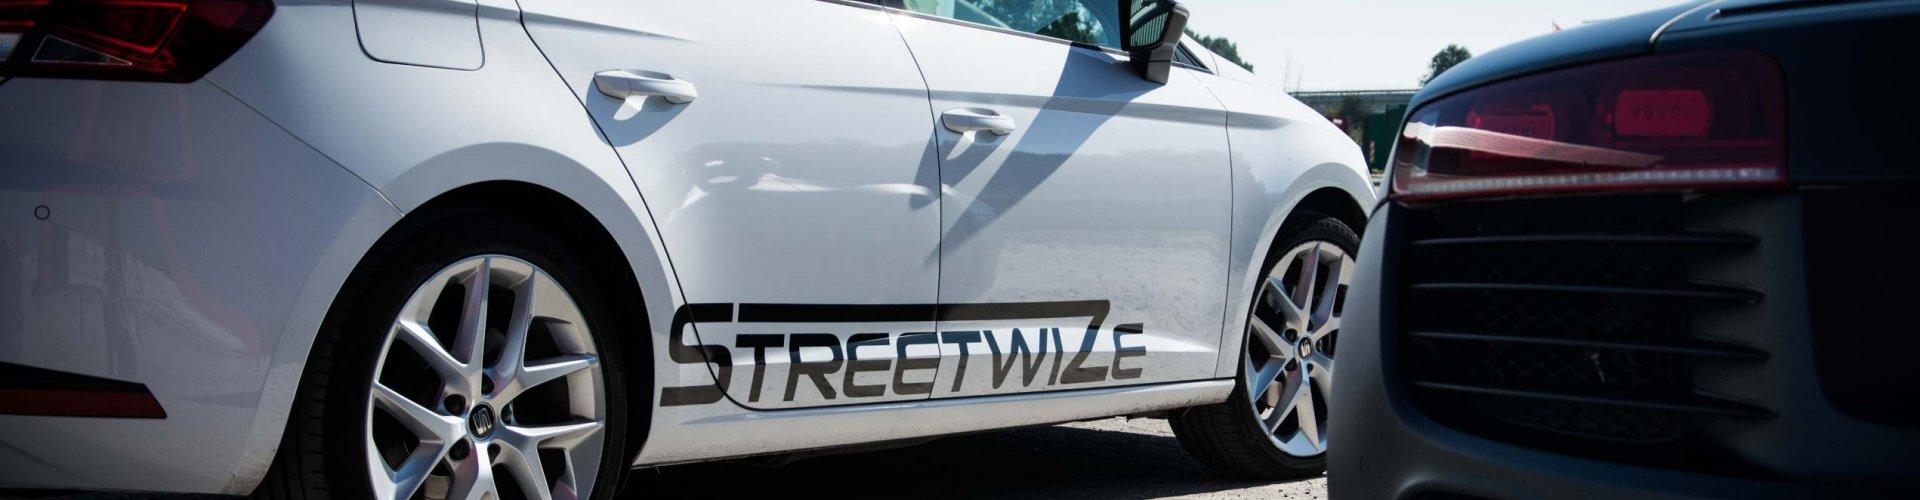 Streetwize autorijschool in almere